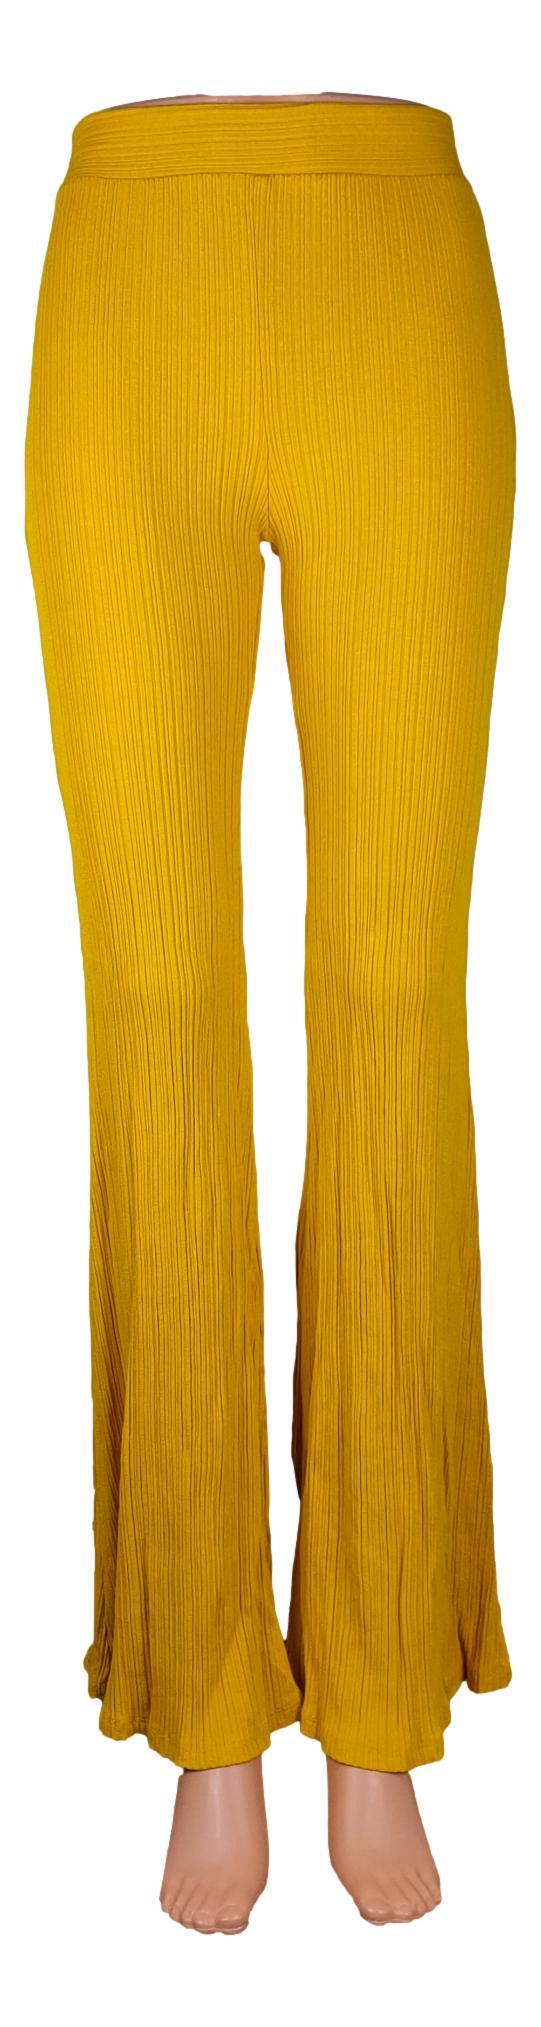 Pantalon Bershka -Taille M